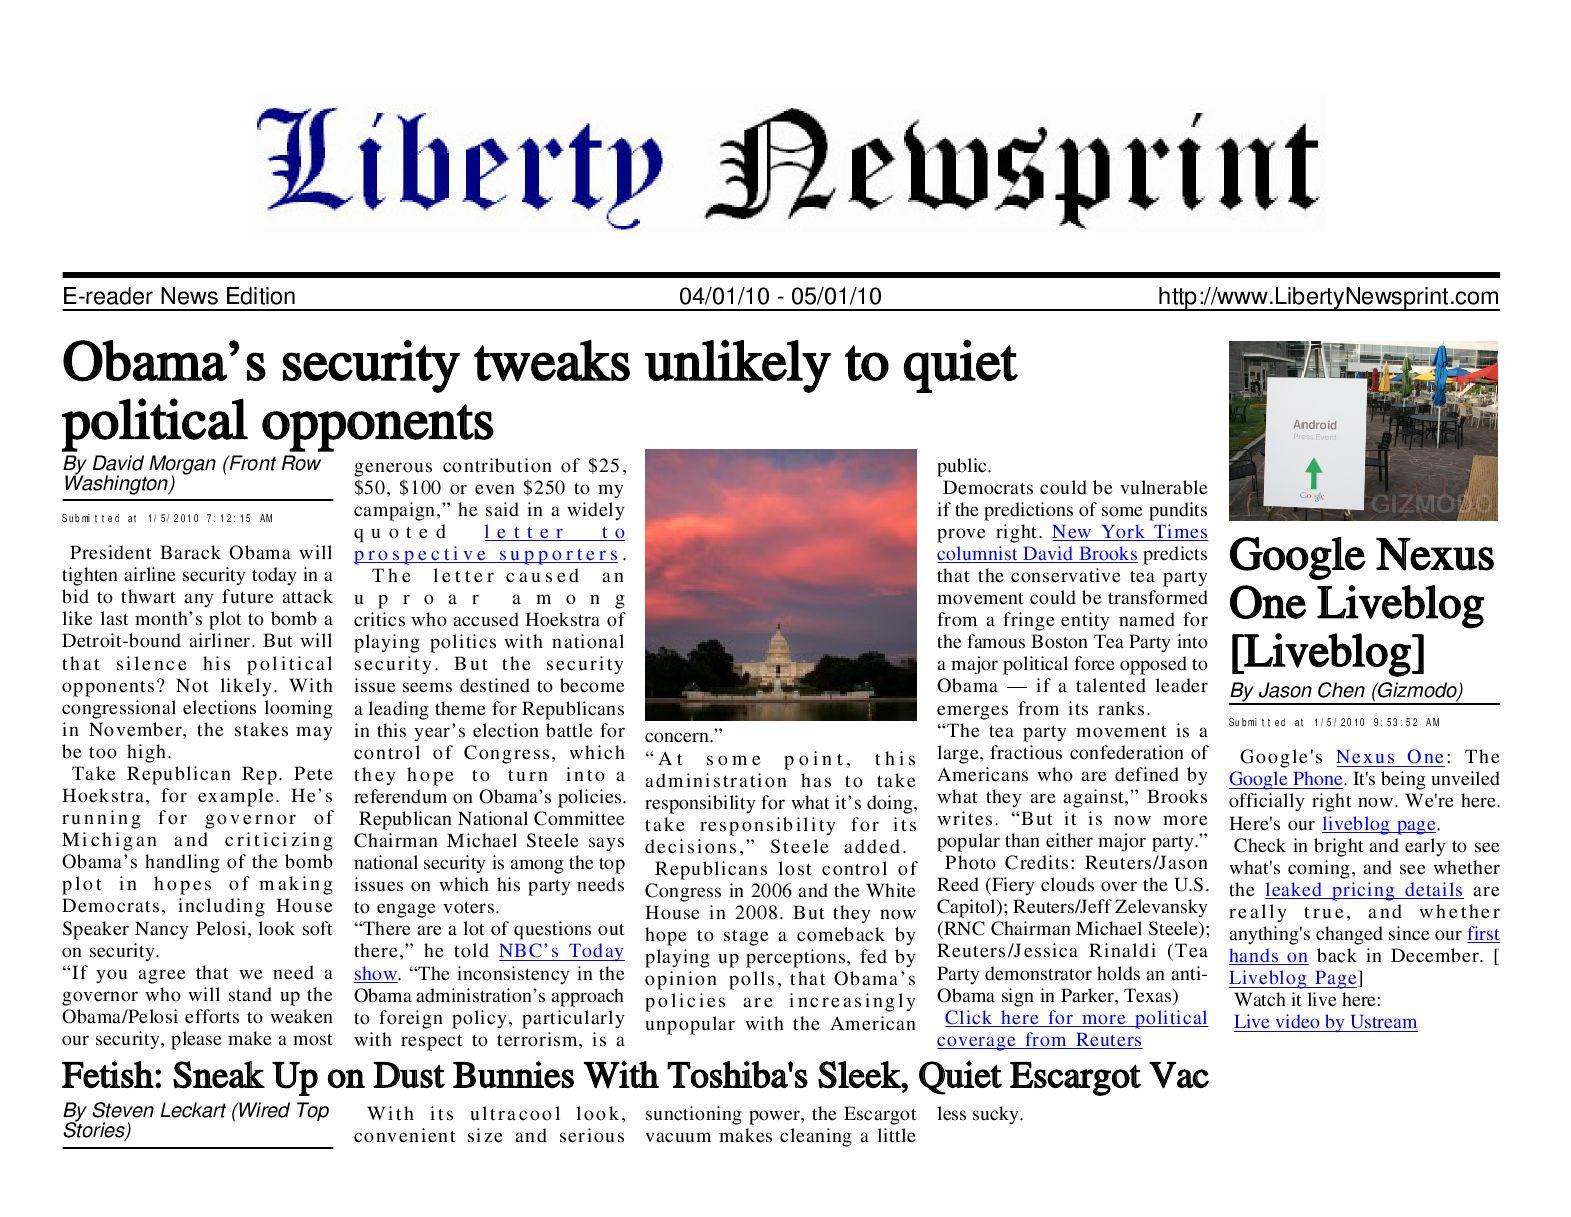 Liberty newsprint jan 05 10 by liberty newspost issuu fandeluxe Images